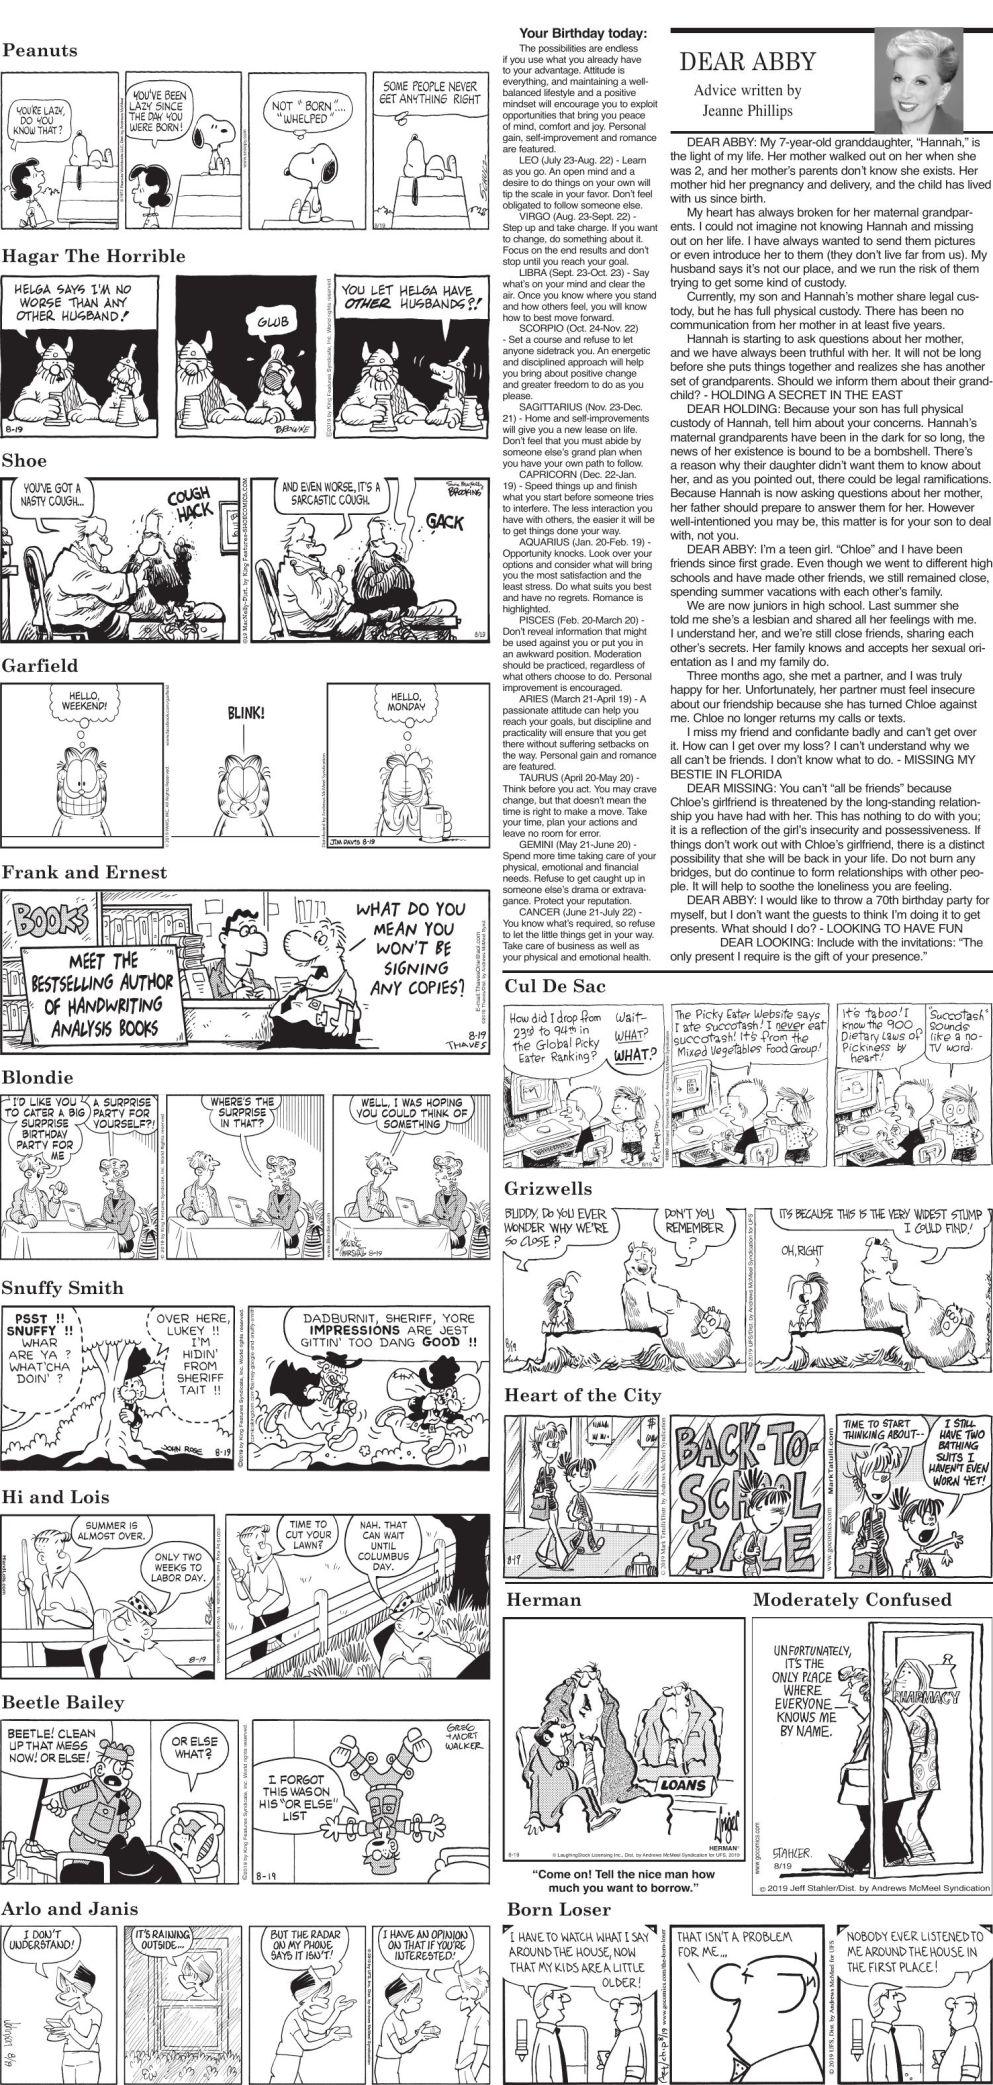 Monday, August 19 comics